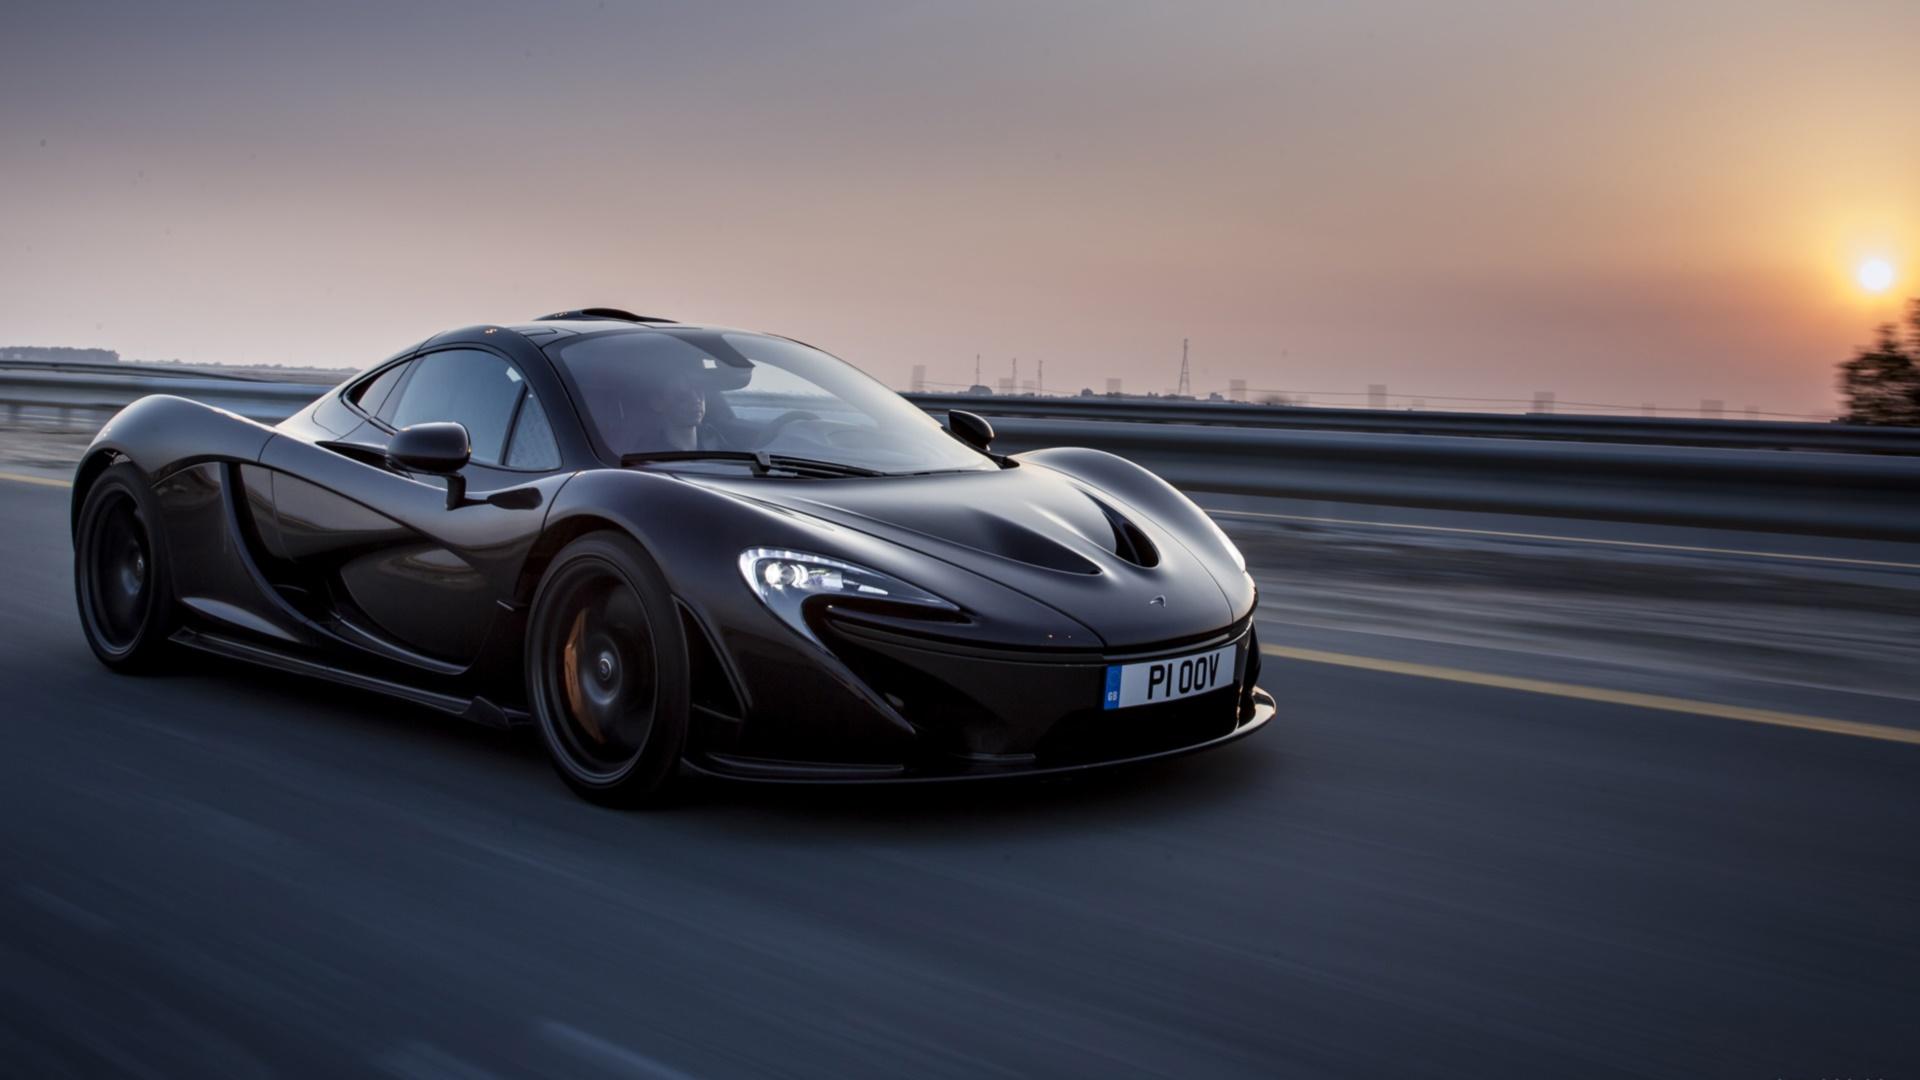 [43+] McLaren P1 Wallpaper Black on WallpaperSafari